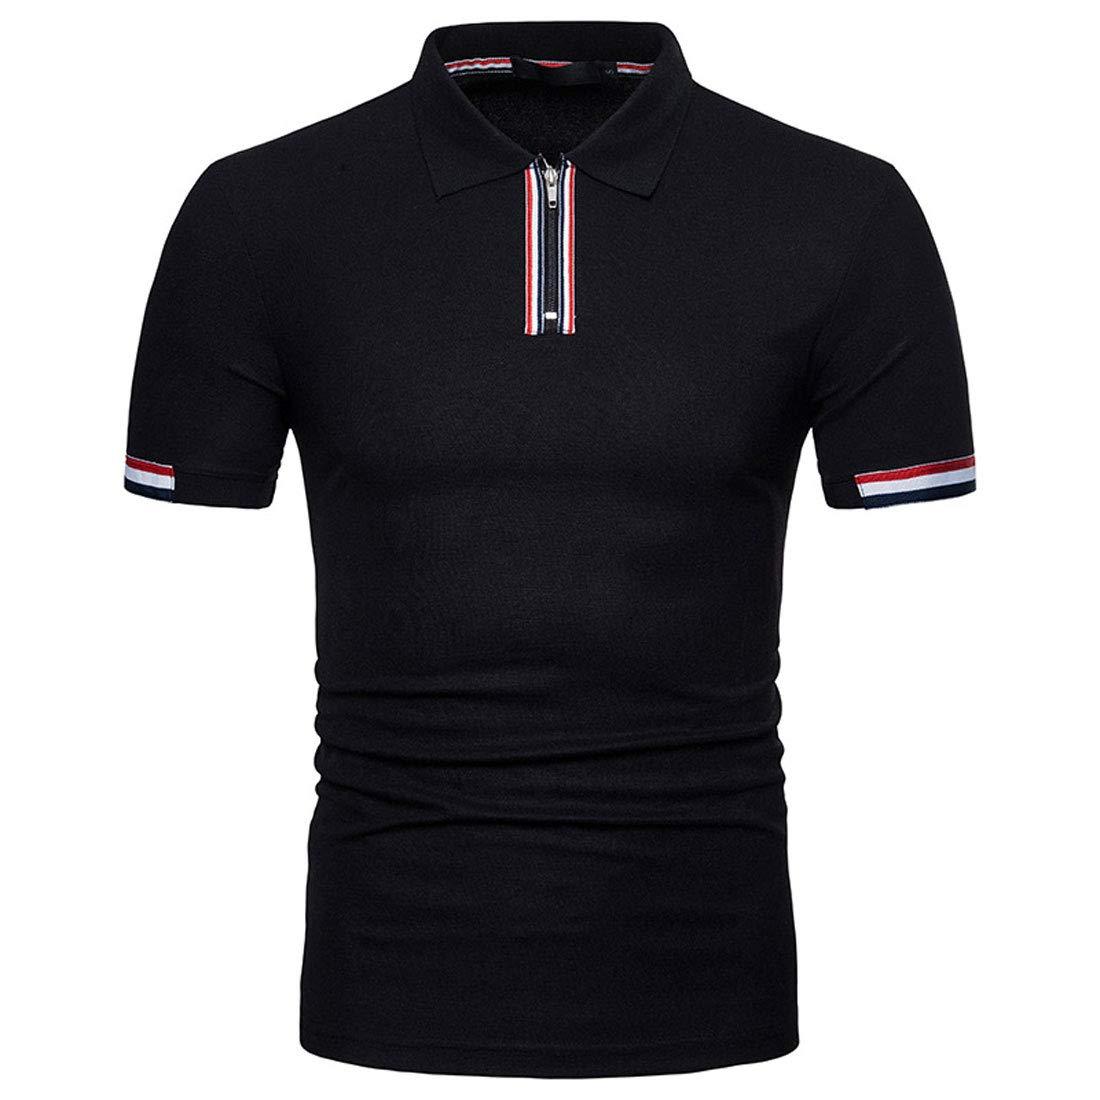 chouyatou Mens Casual Basic Collar Front Zipper Tees Short Sleeve Polo T-Shirt